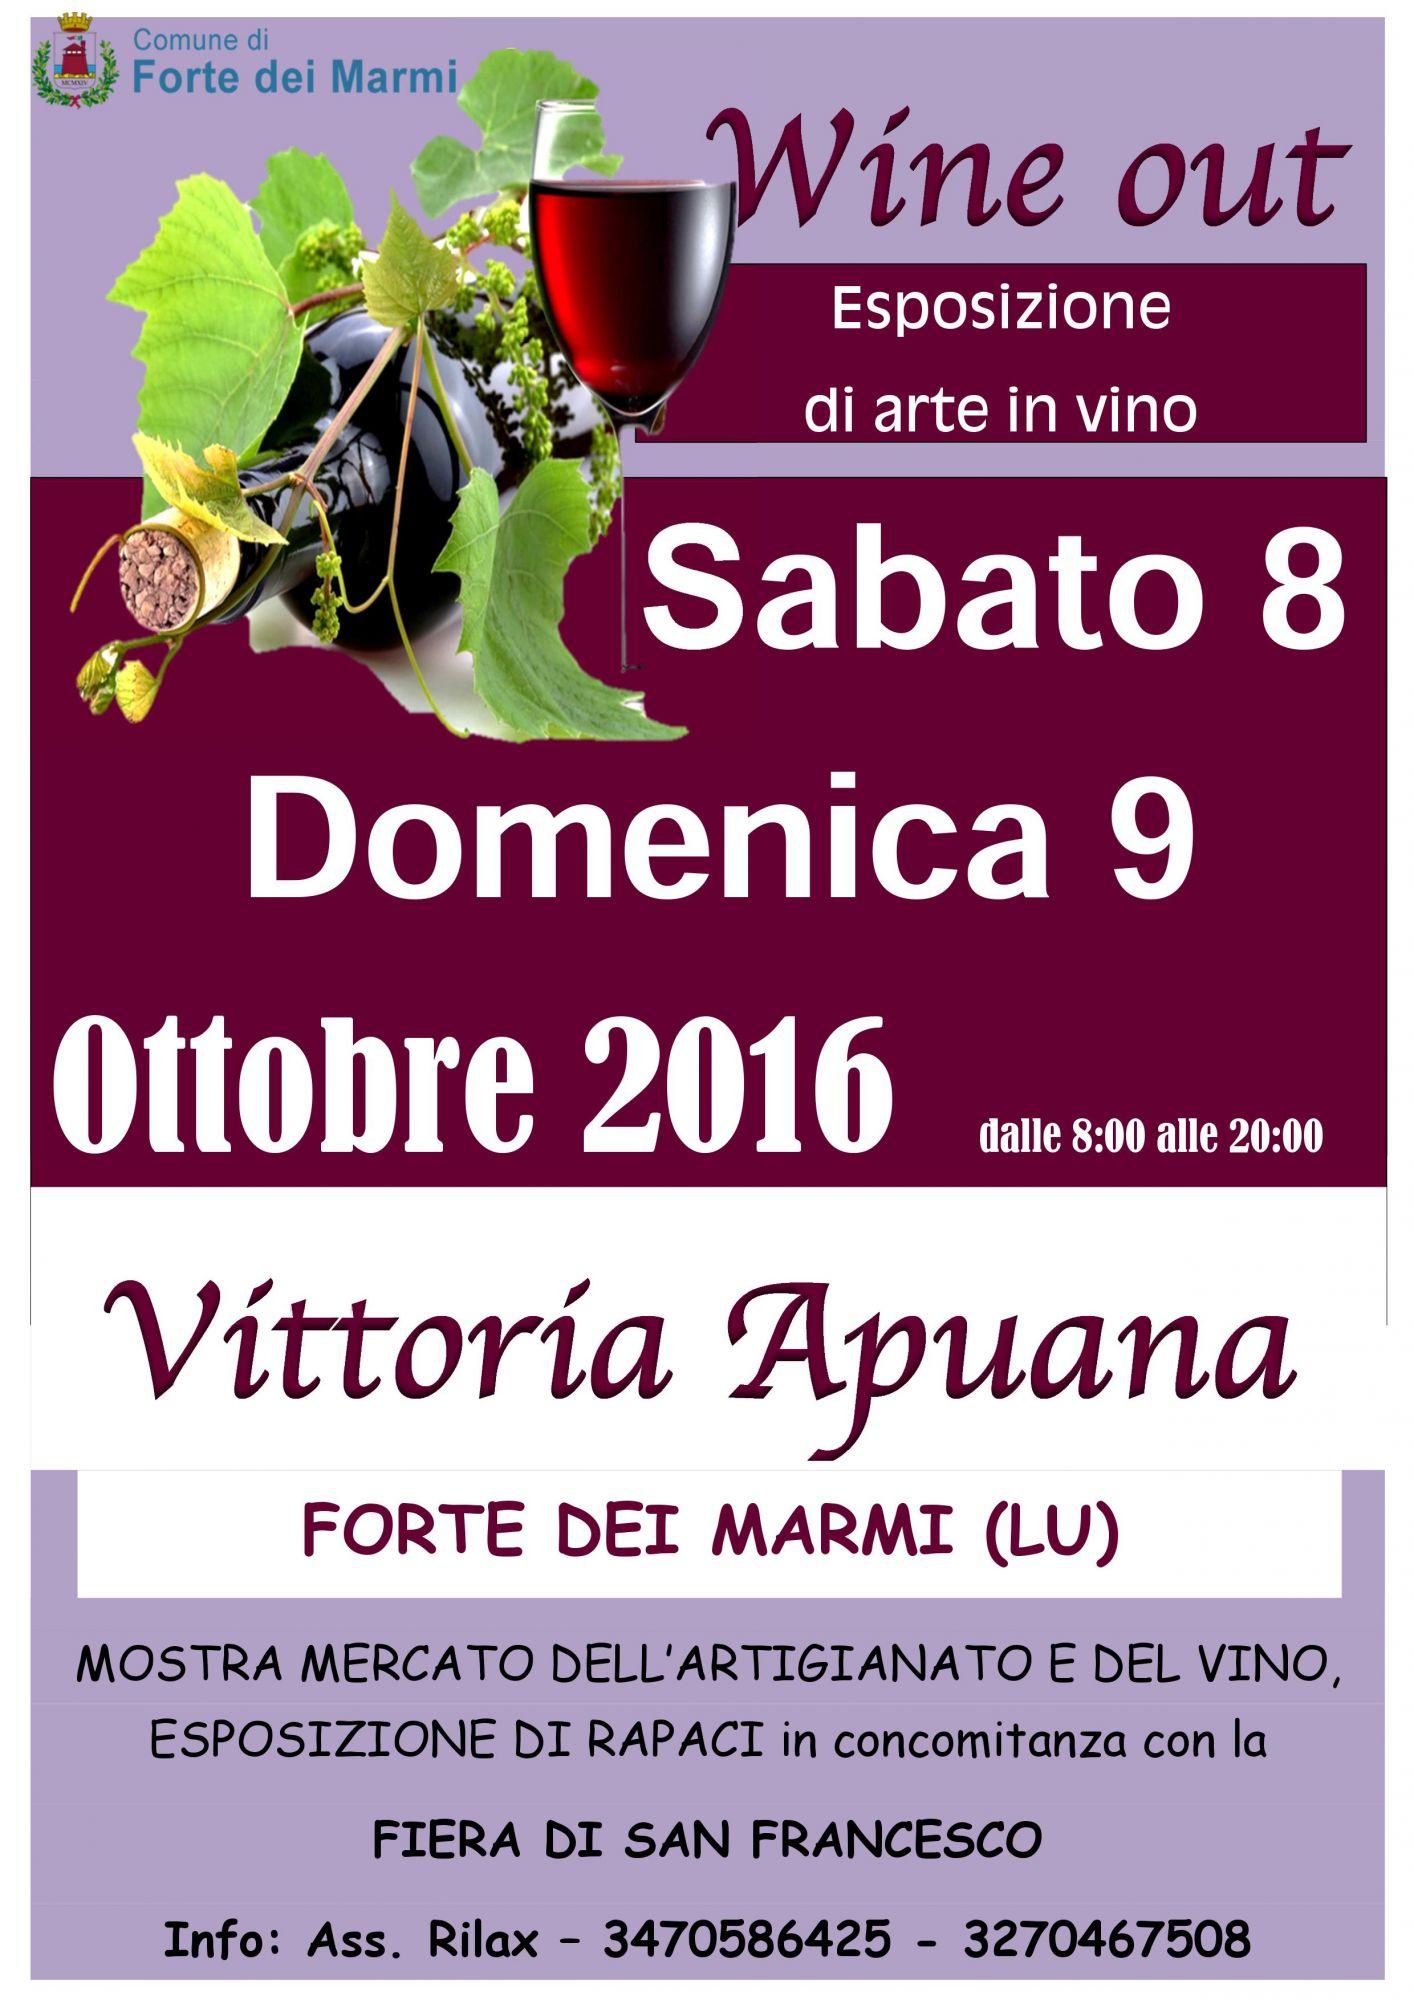 A Vittoria Apuana arriva Wine Out, arte e vino in strada